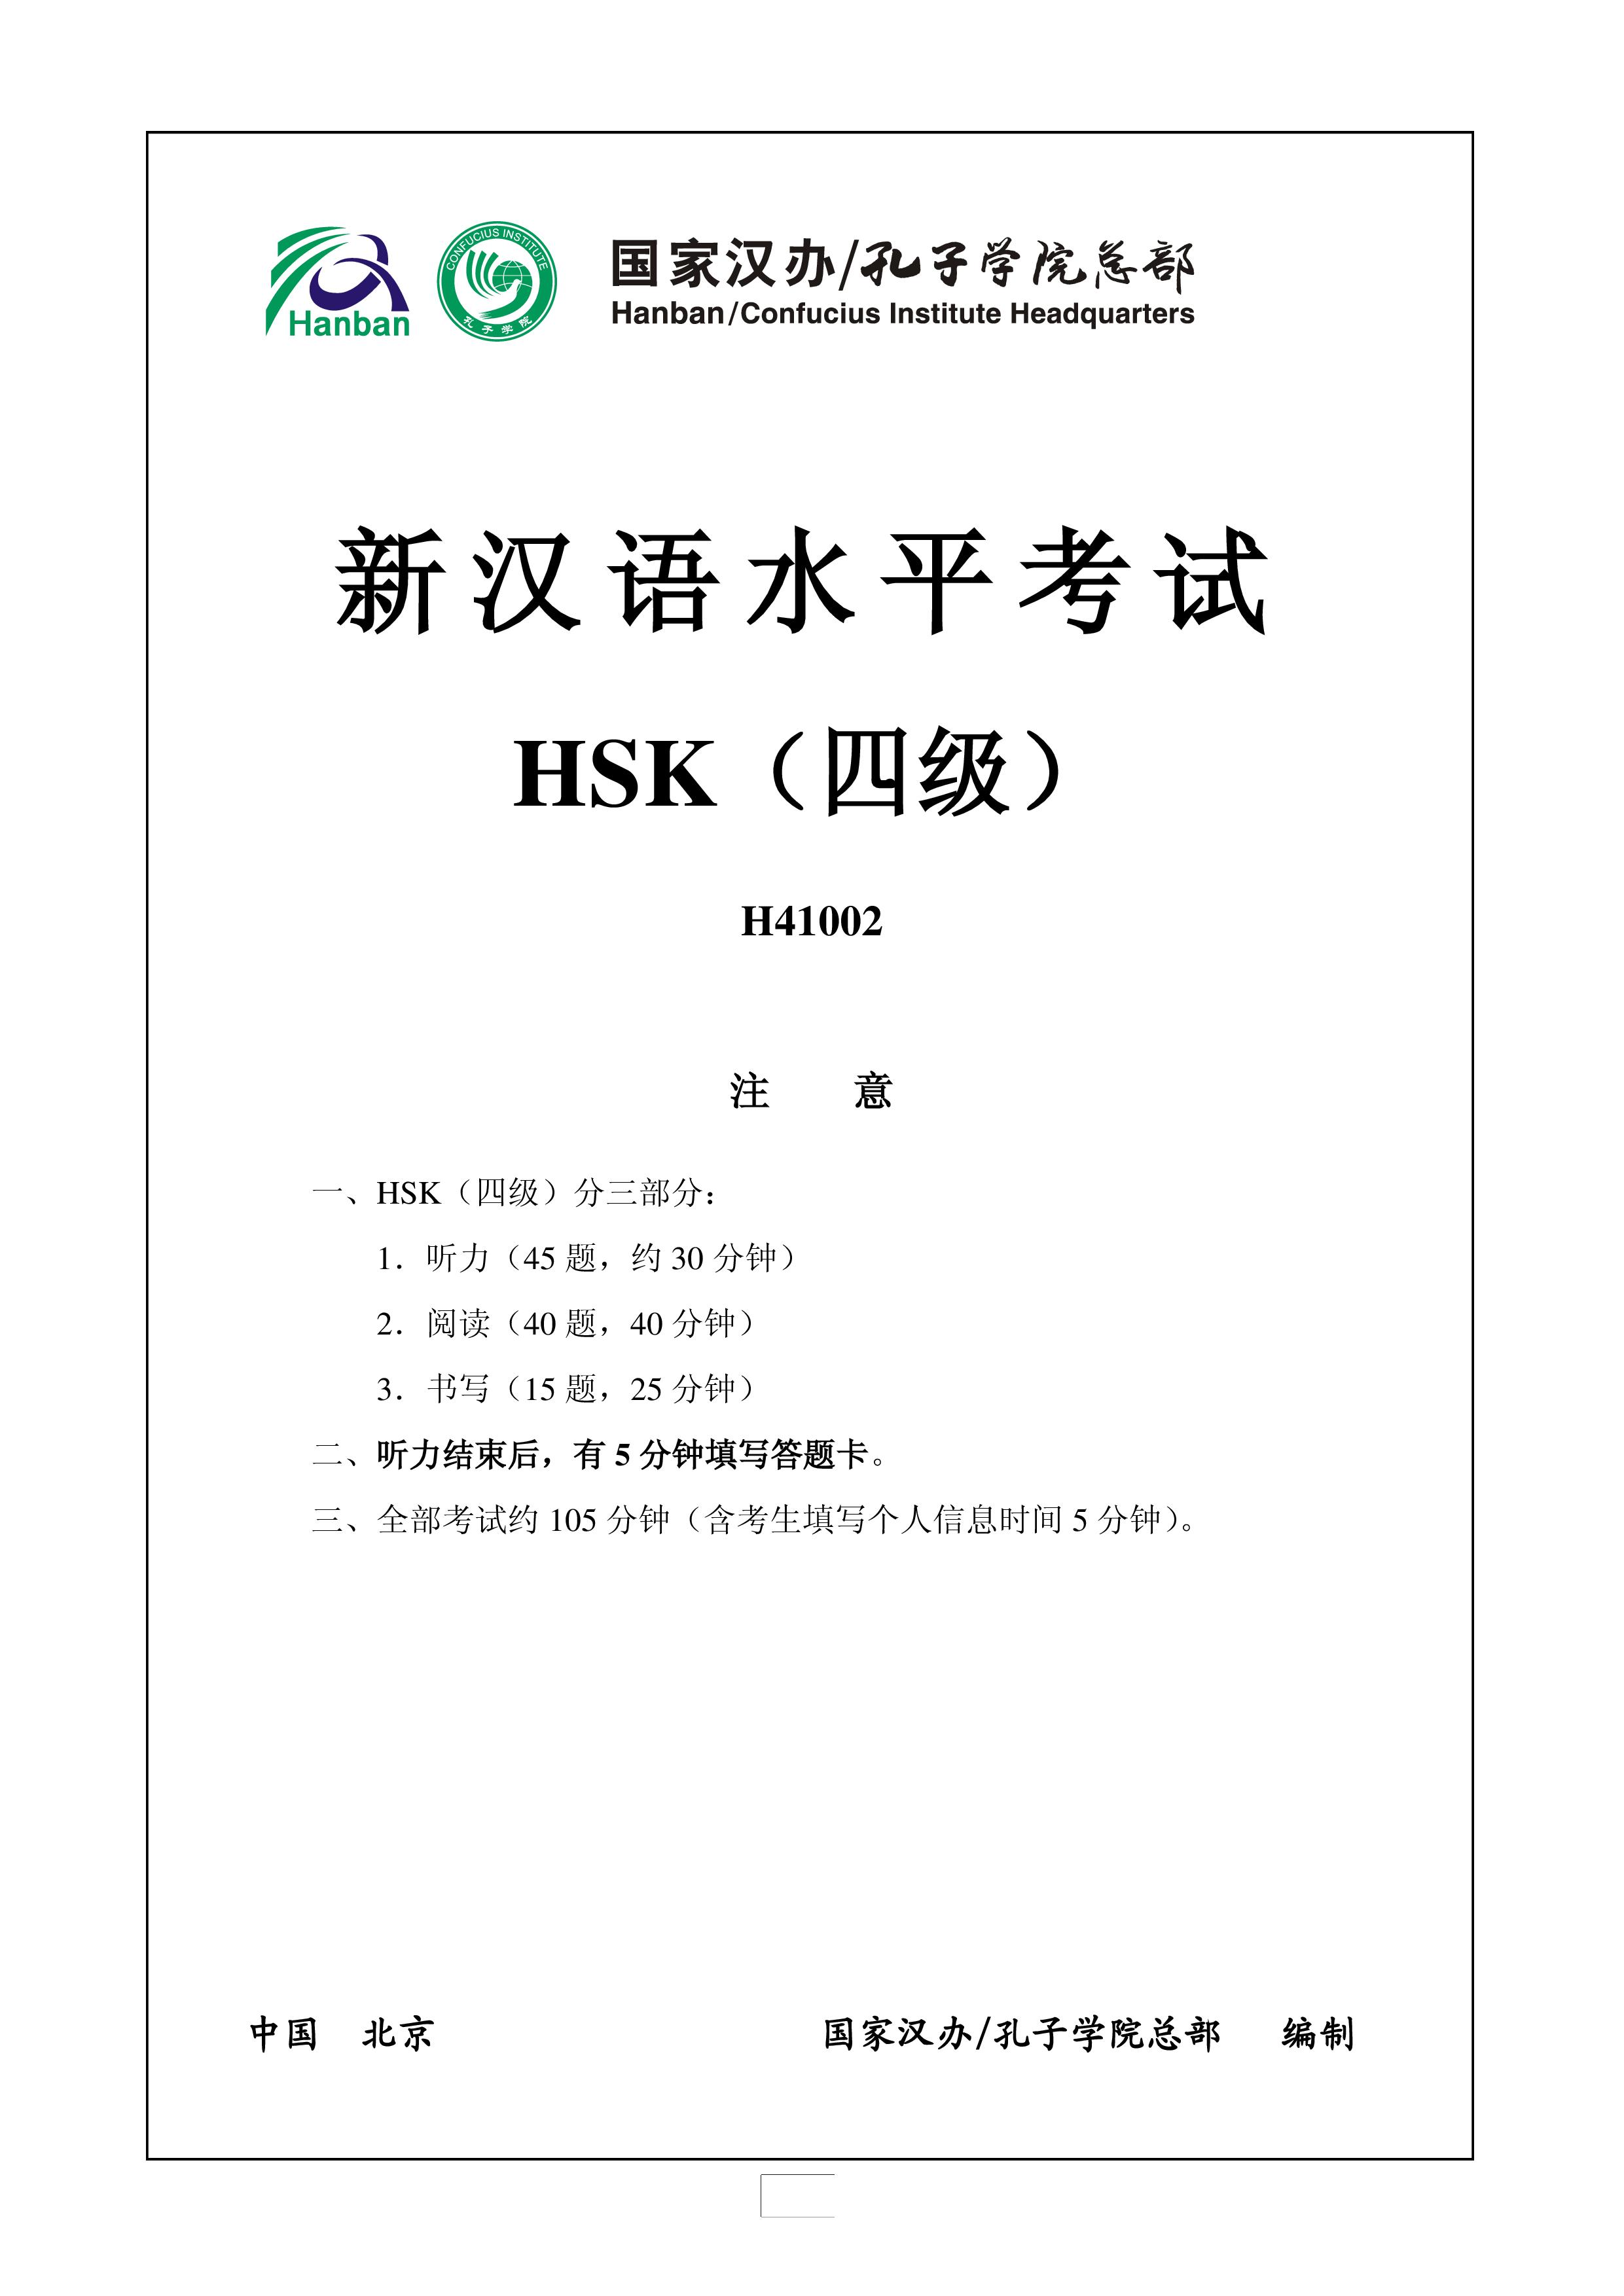 HSK4 Chinese Words Test - Chinese Words Test HSK4